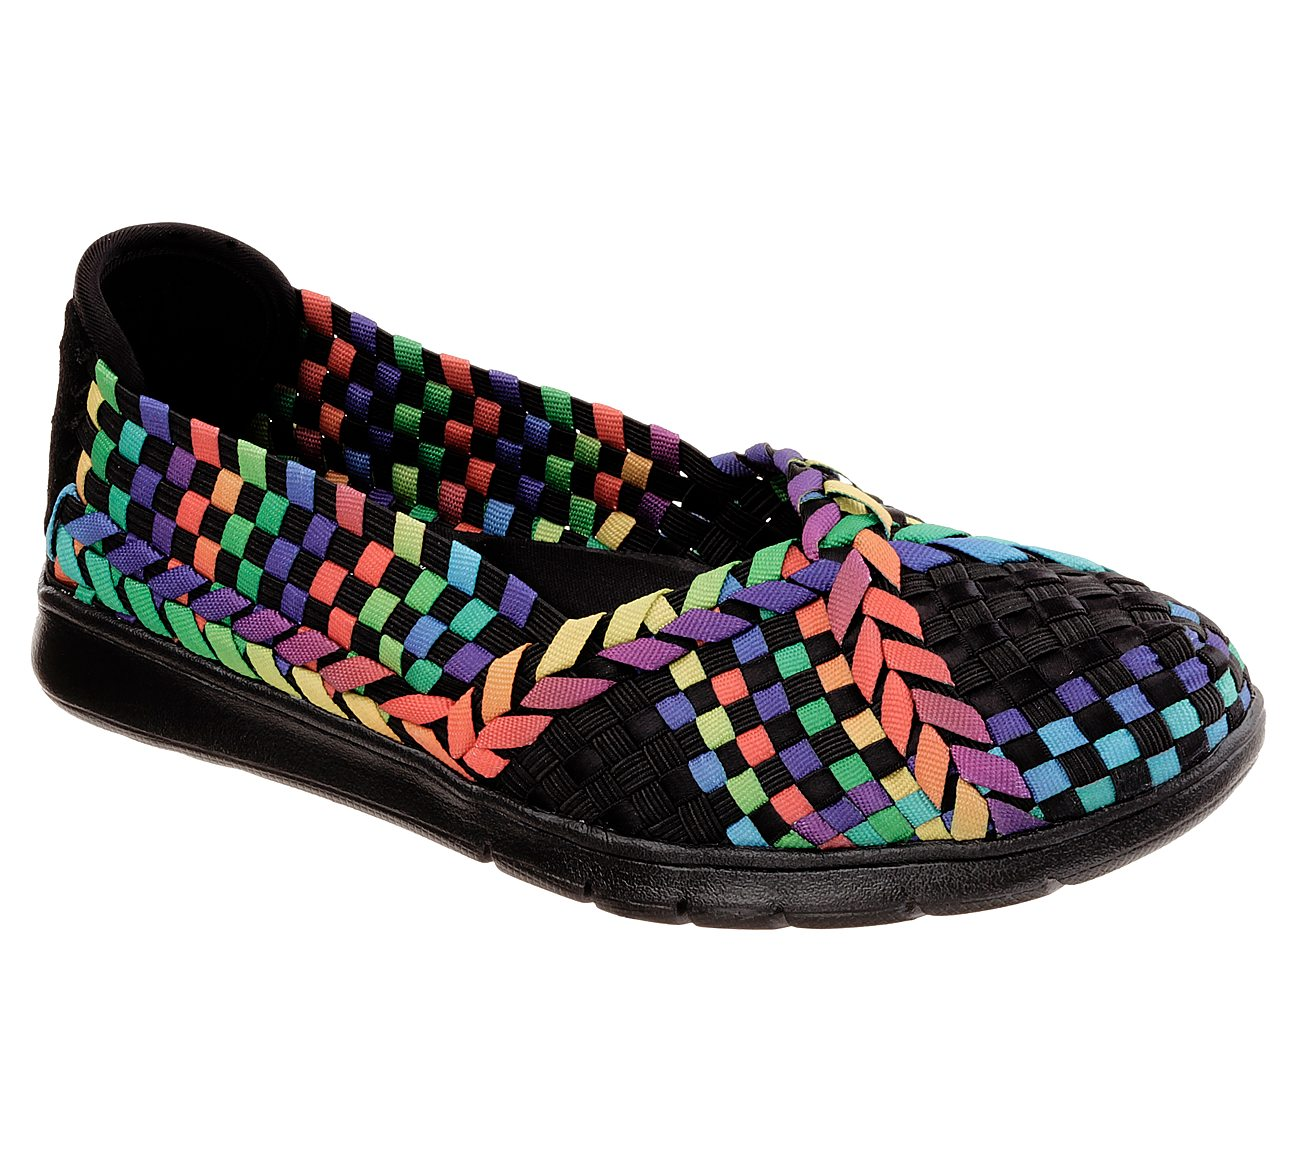 BOBS Shoes  BOBS Hologram 33600 Womens Flats Black Multi